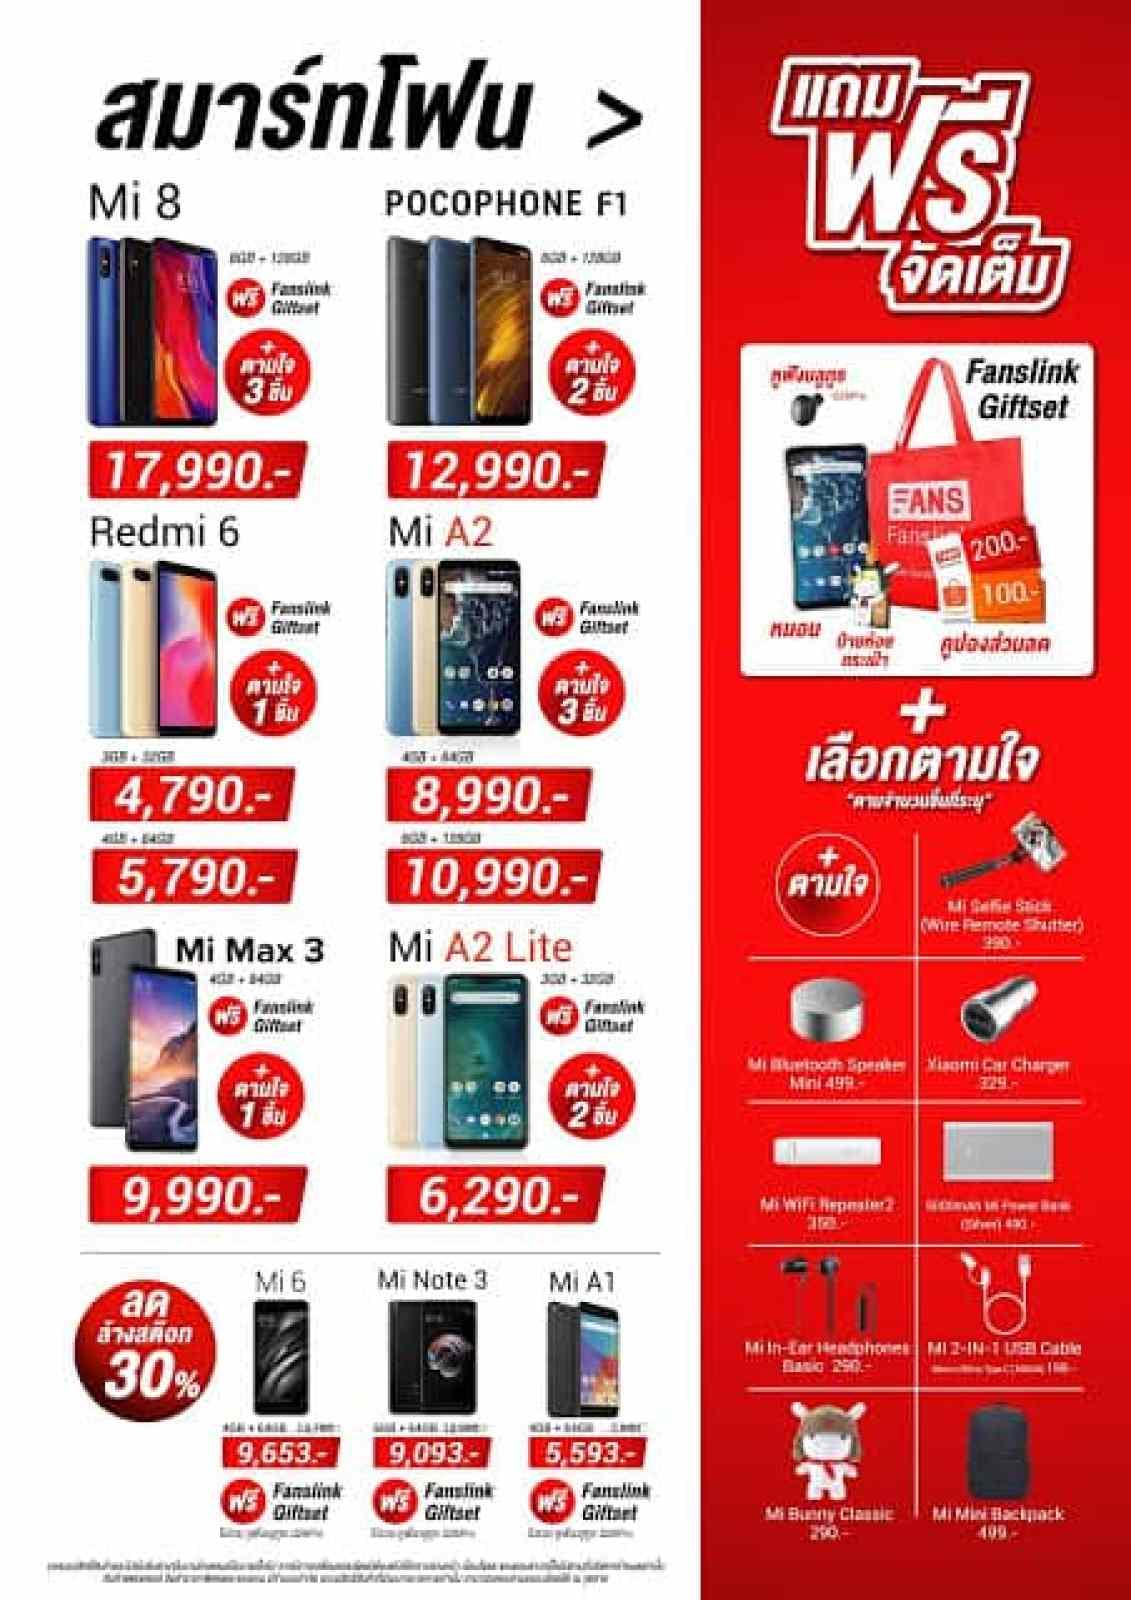 - 20180926 TME Smartphone Fanslink Gift Set 2 - Mi Store by Fanslink  จัดโปรโมชั่น ลดสูงสุดถึง 30% ในงาน TME 2018